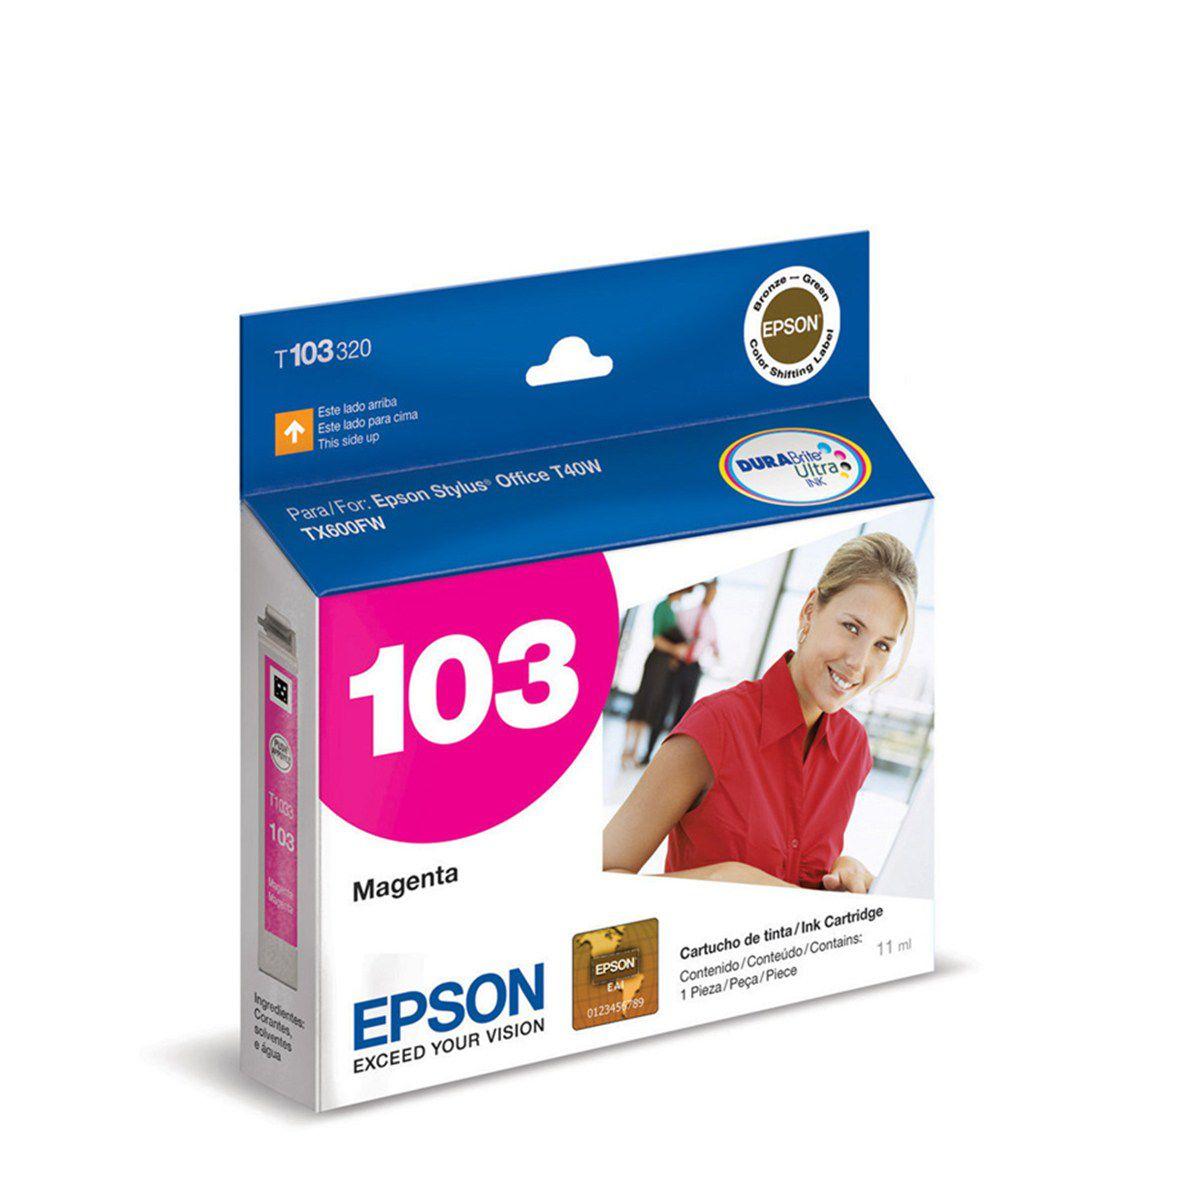 Cartucho Epson T103320 T103 103 Magenta para T40w TX600FW T1110 TX515 TX550w